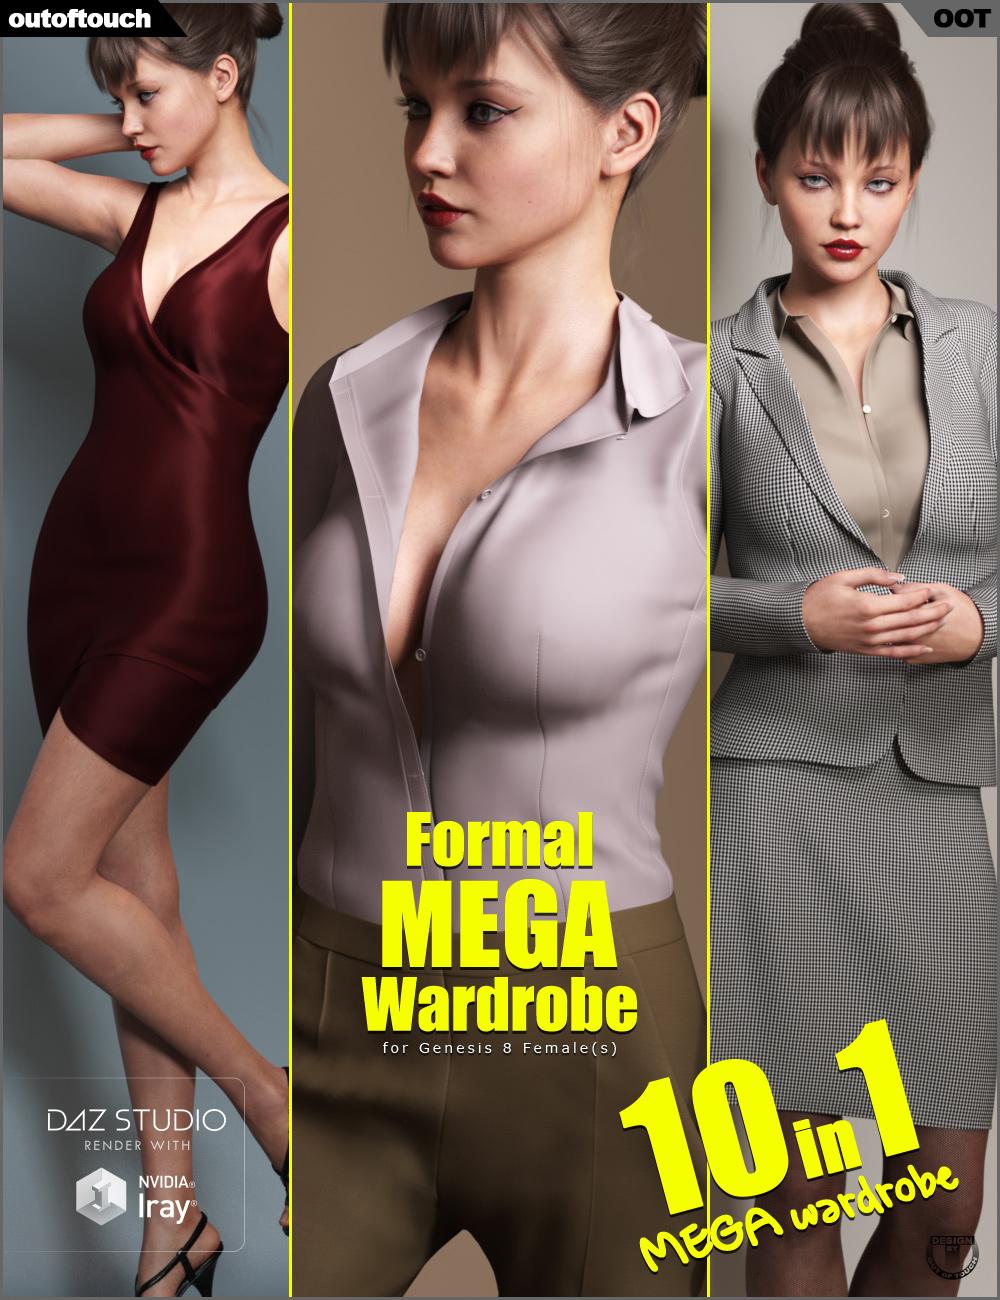 Formal MEGA Wardrobe for Genesis 8 Female(s) by: outoftouch, 3D Models by Daz 3D